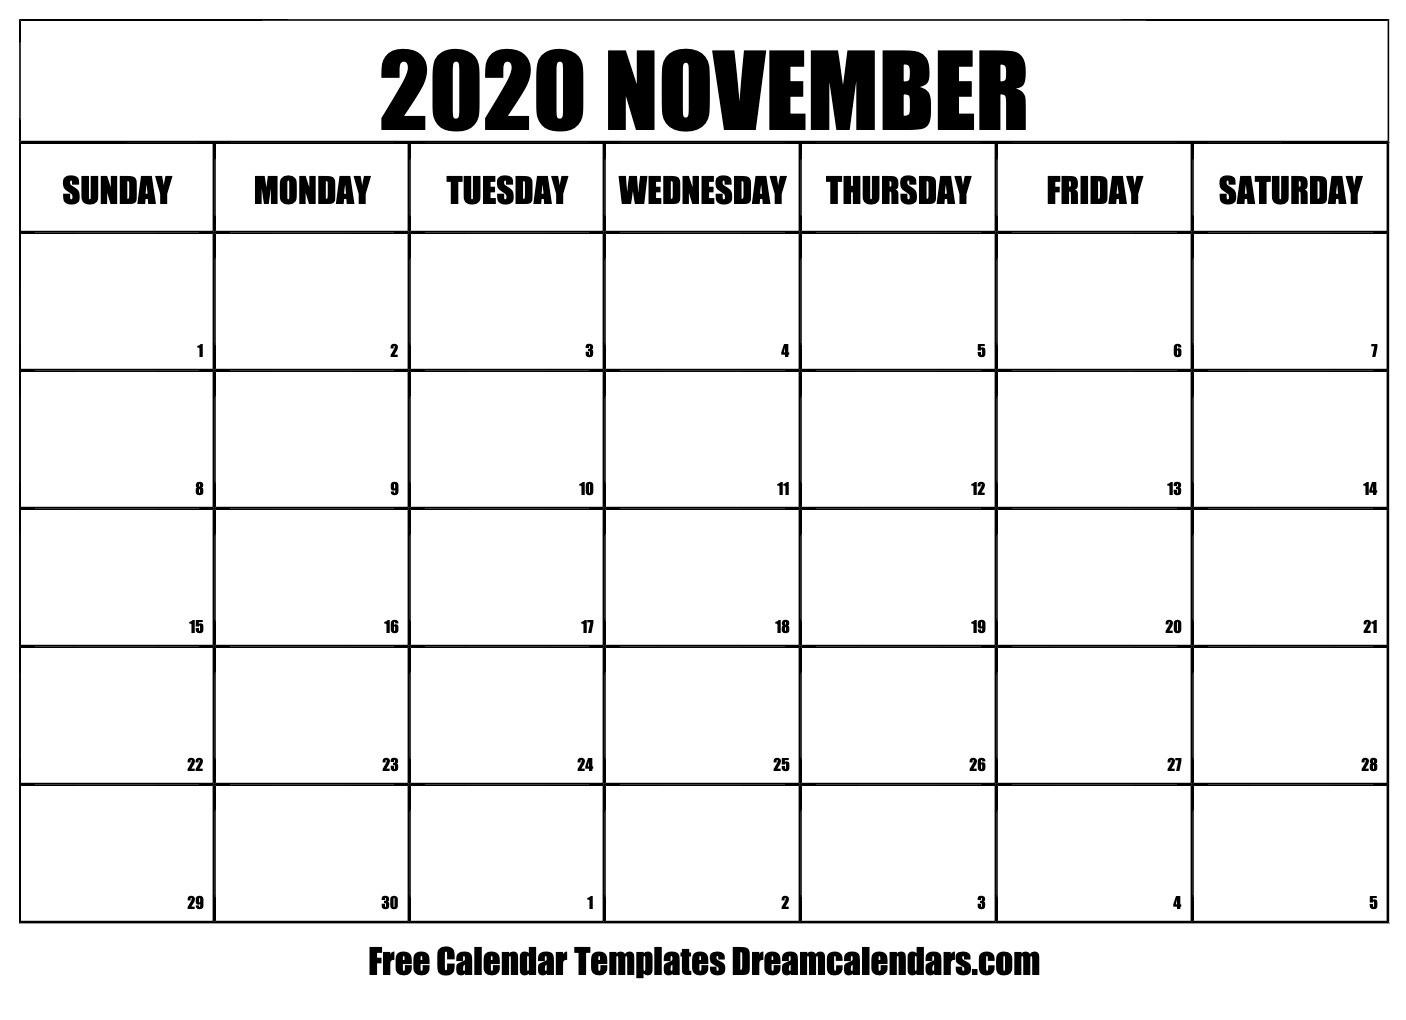 Printable November 2020 Calendar Templates - Helena Orstem